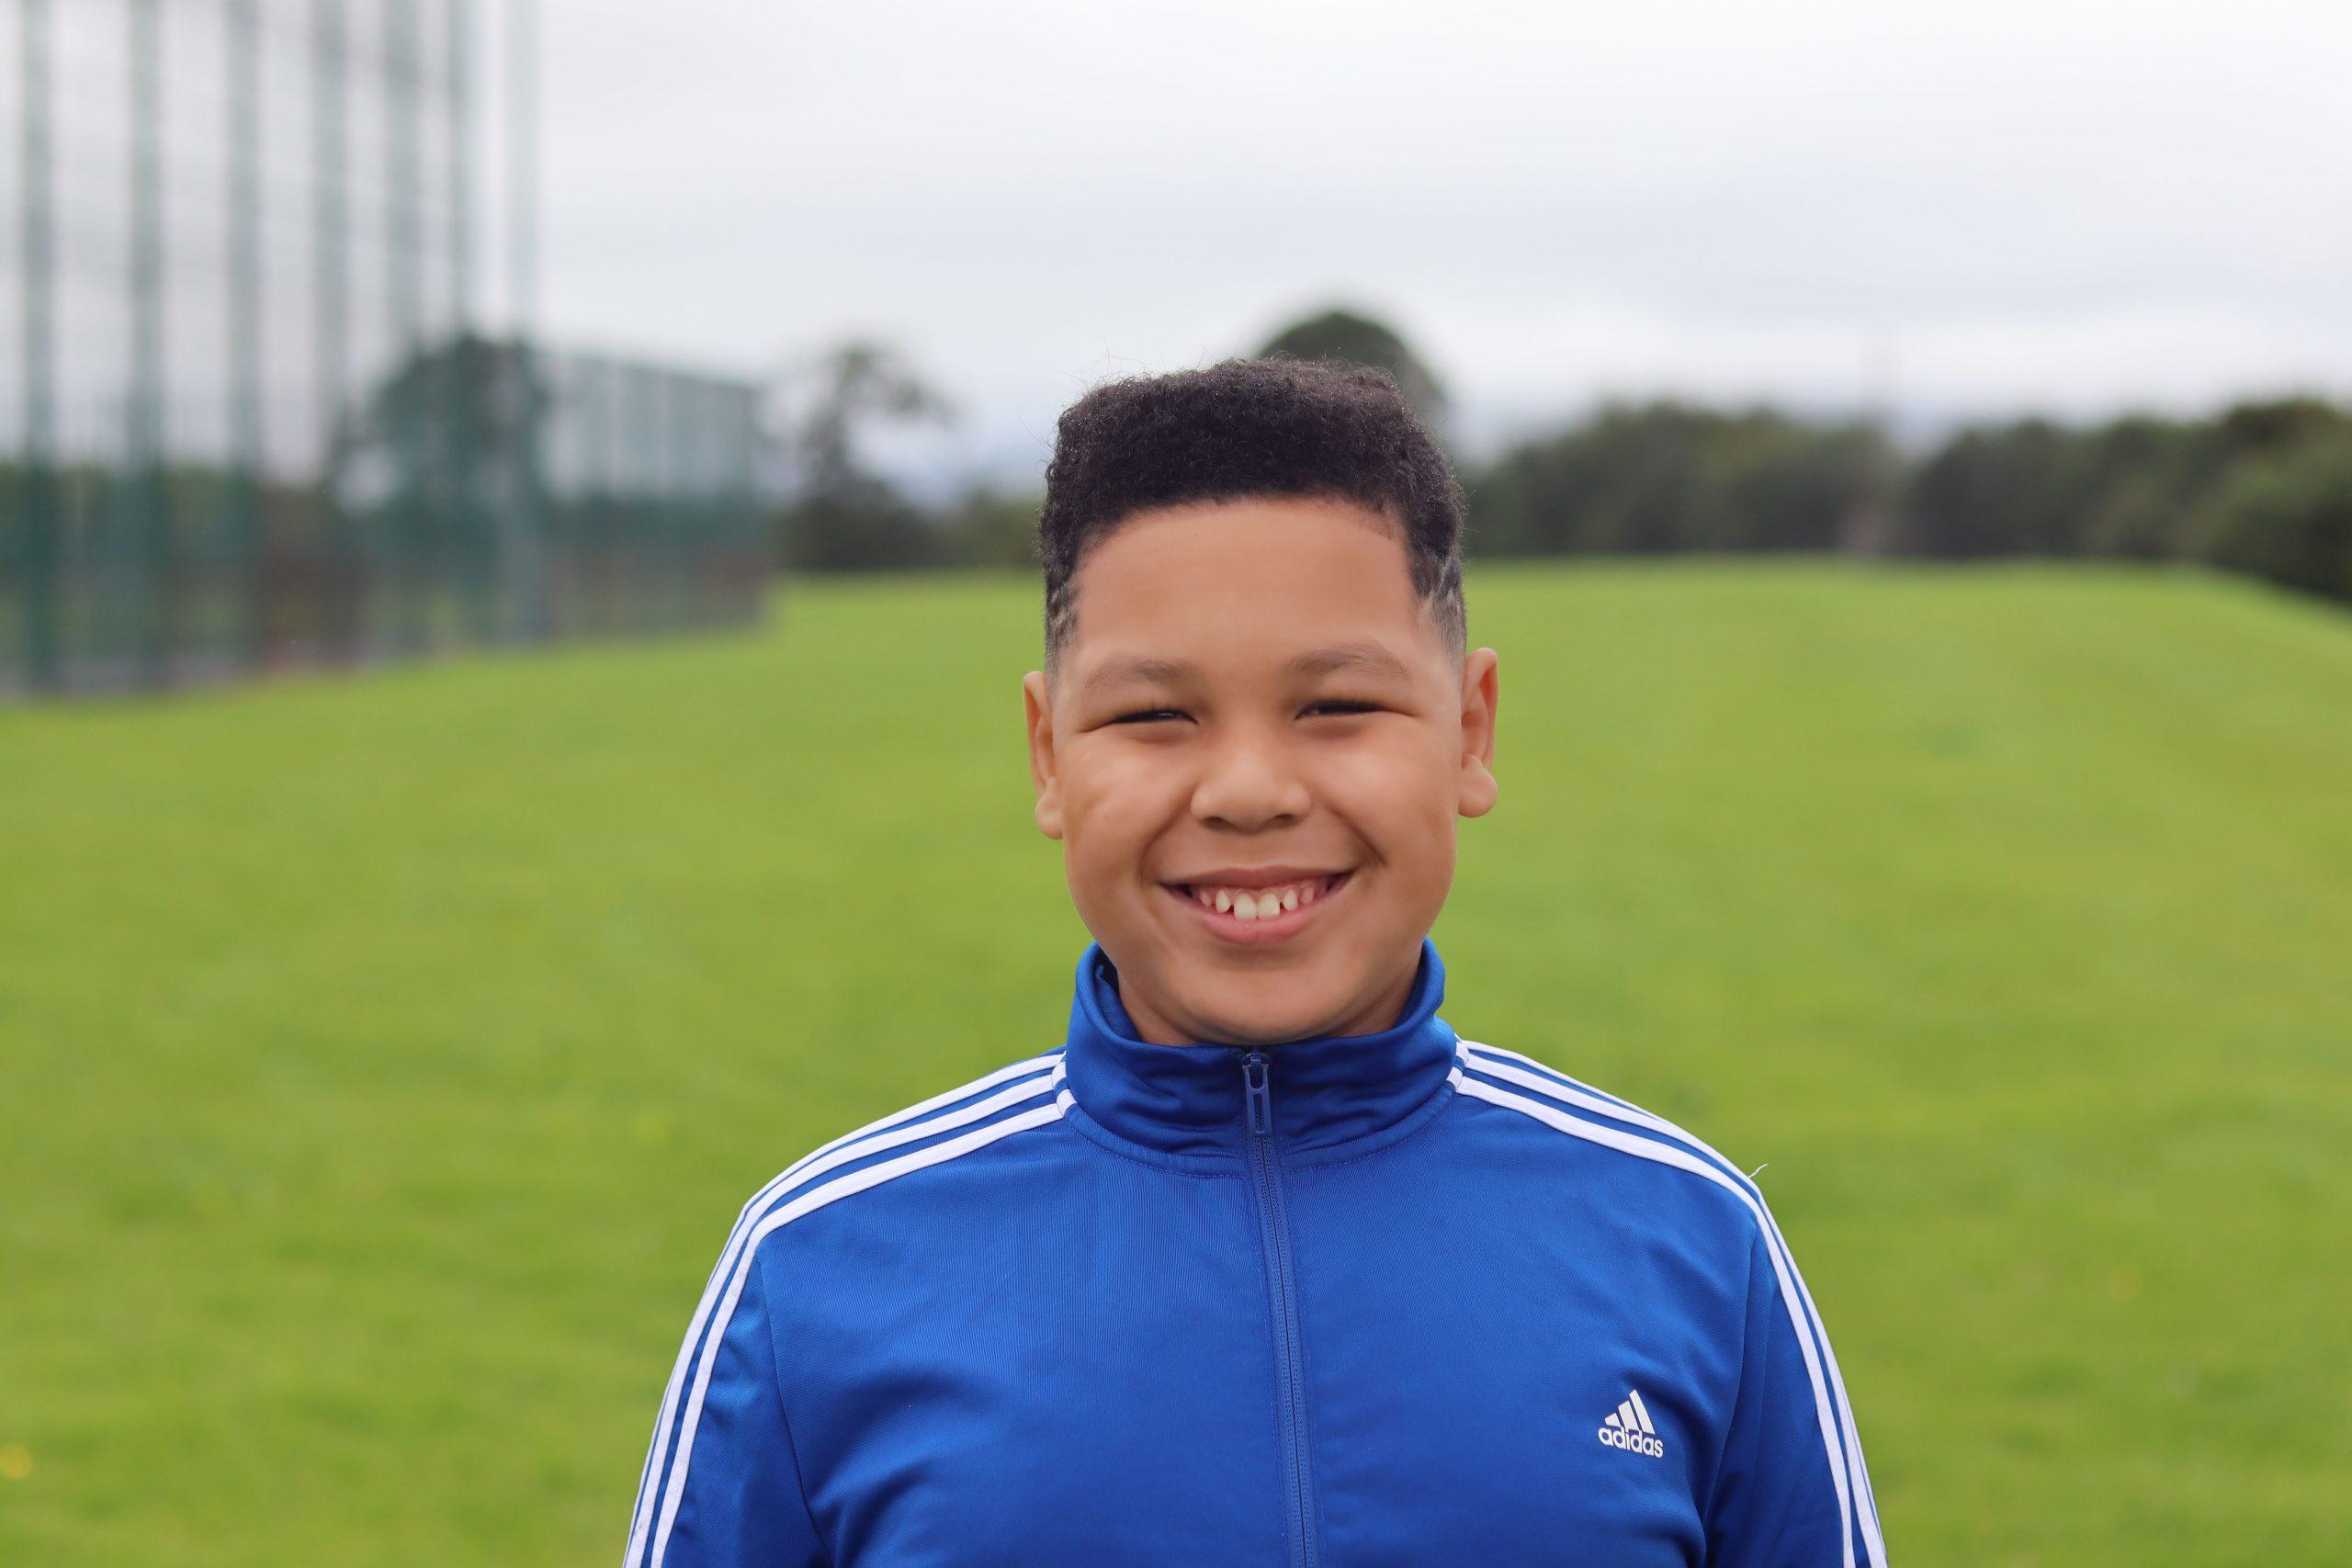 Mid Ulster boy's lockdown nature film receives UK-wide plaudits